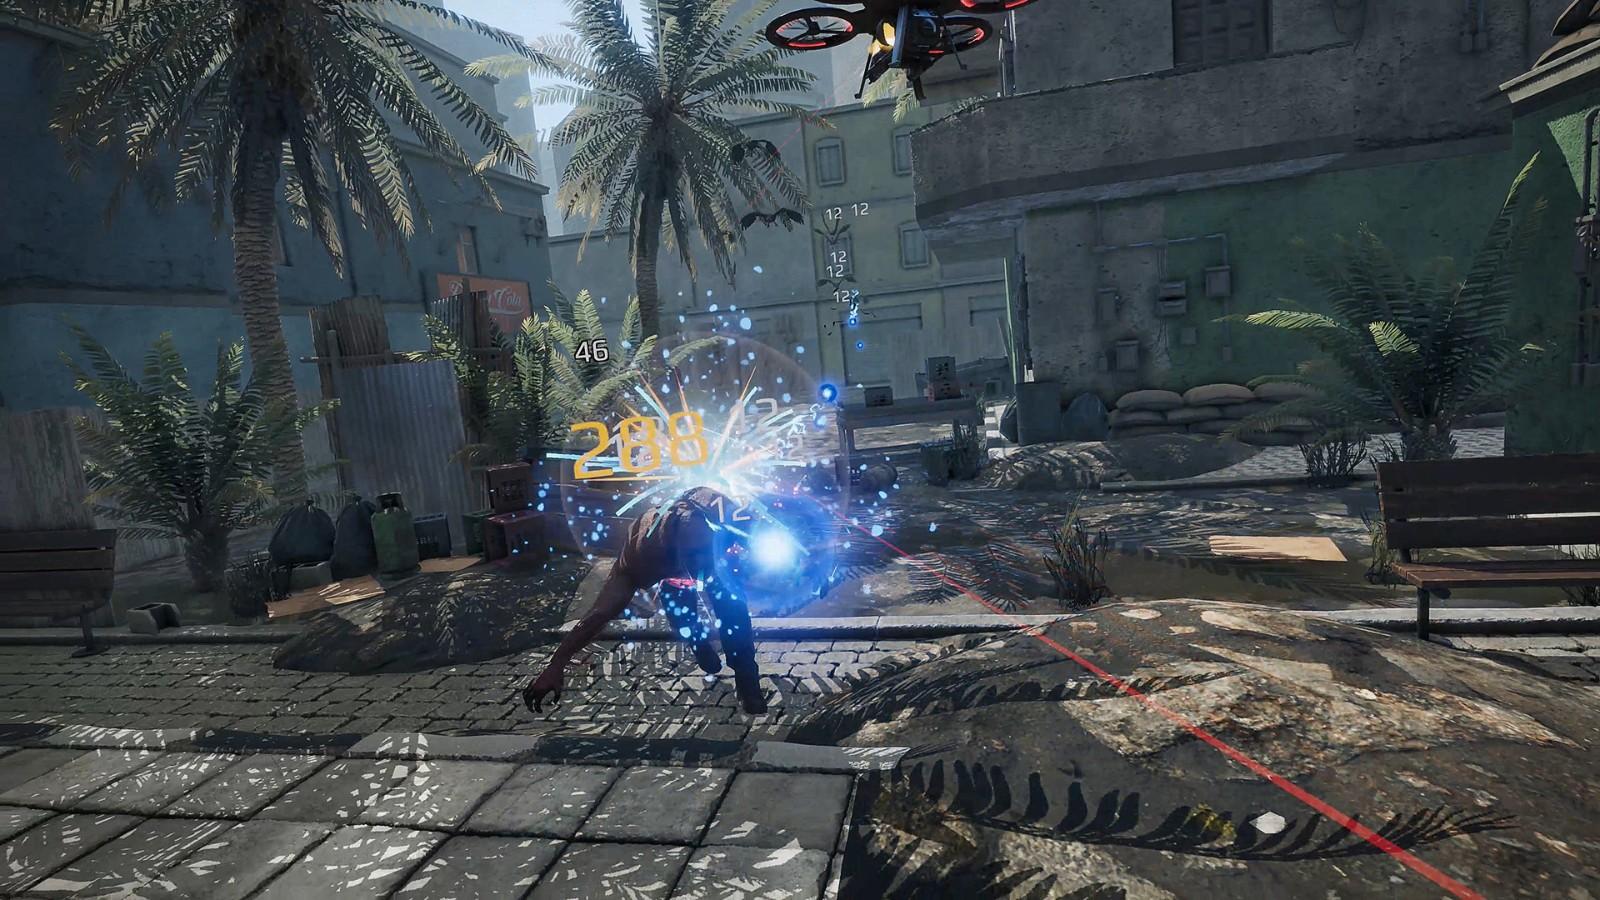 VR僵尸射击游戏《VAR》上架Steam 末日之下努力求生